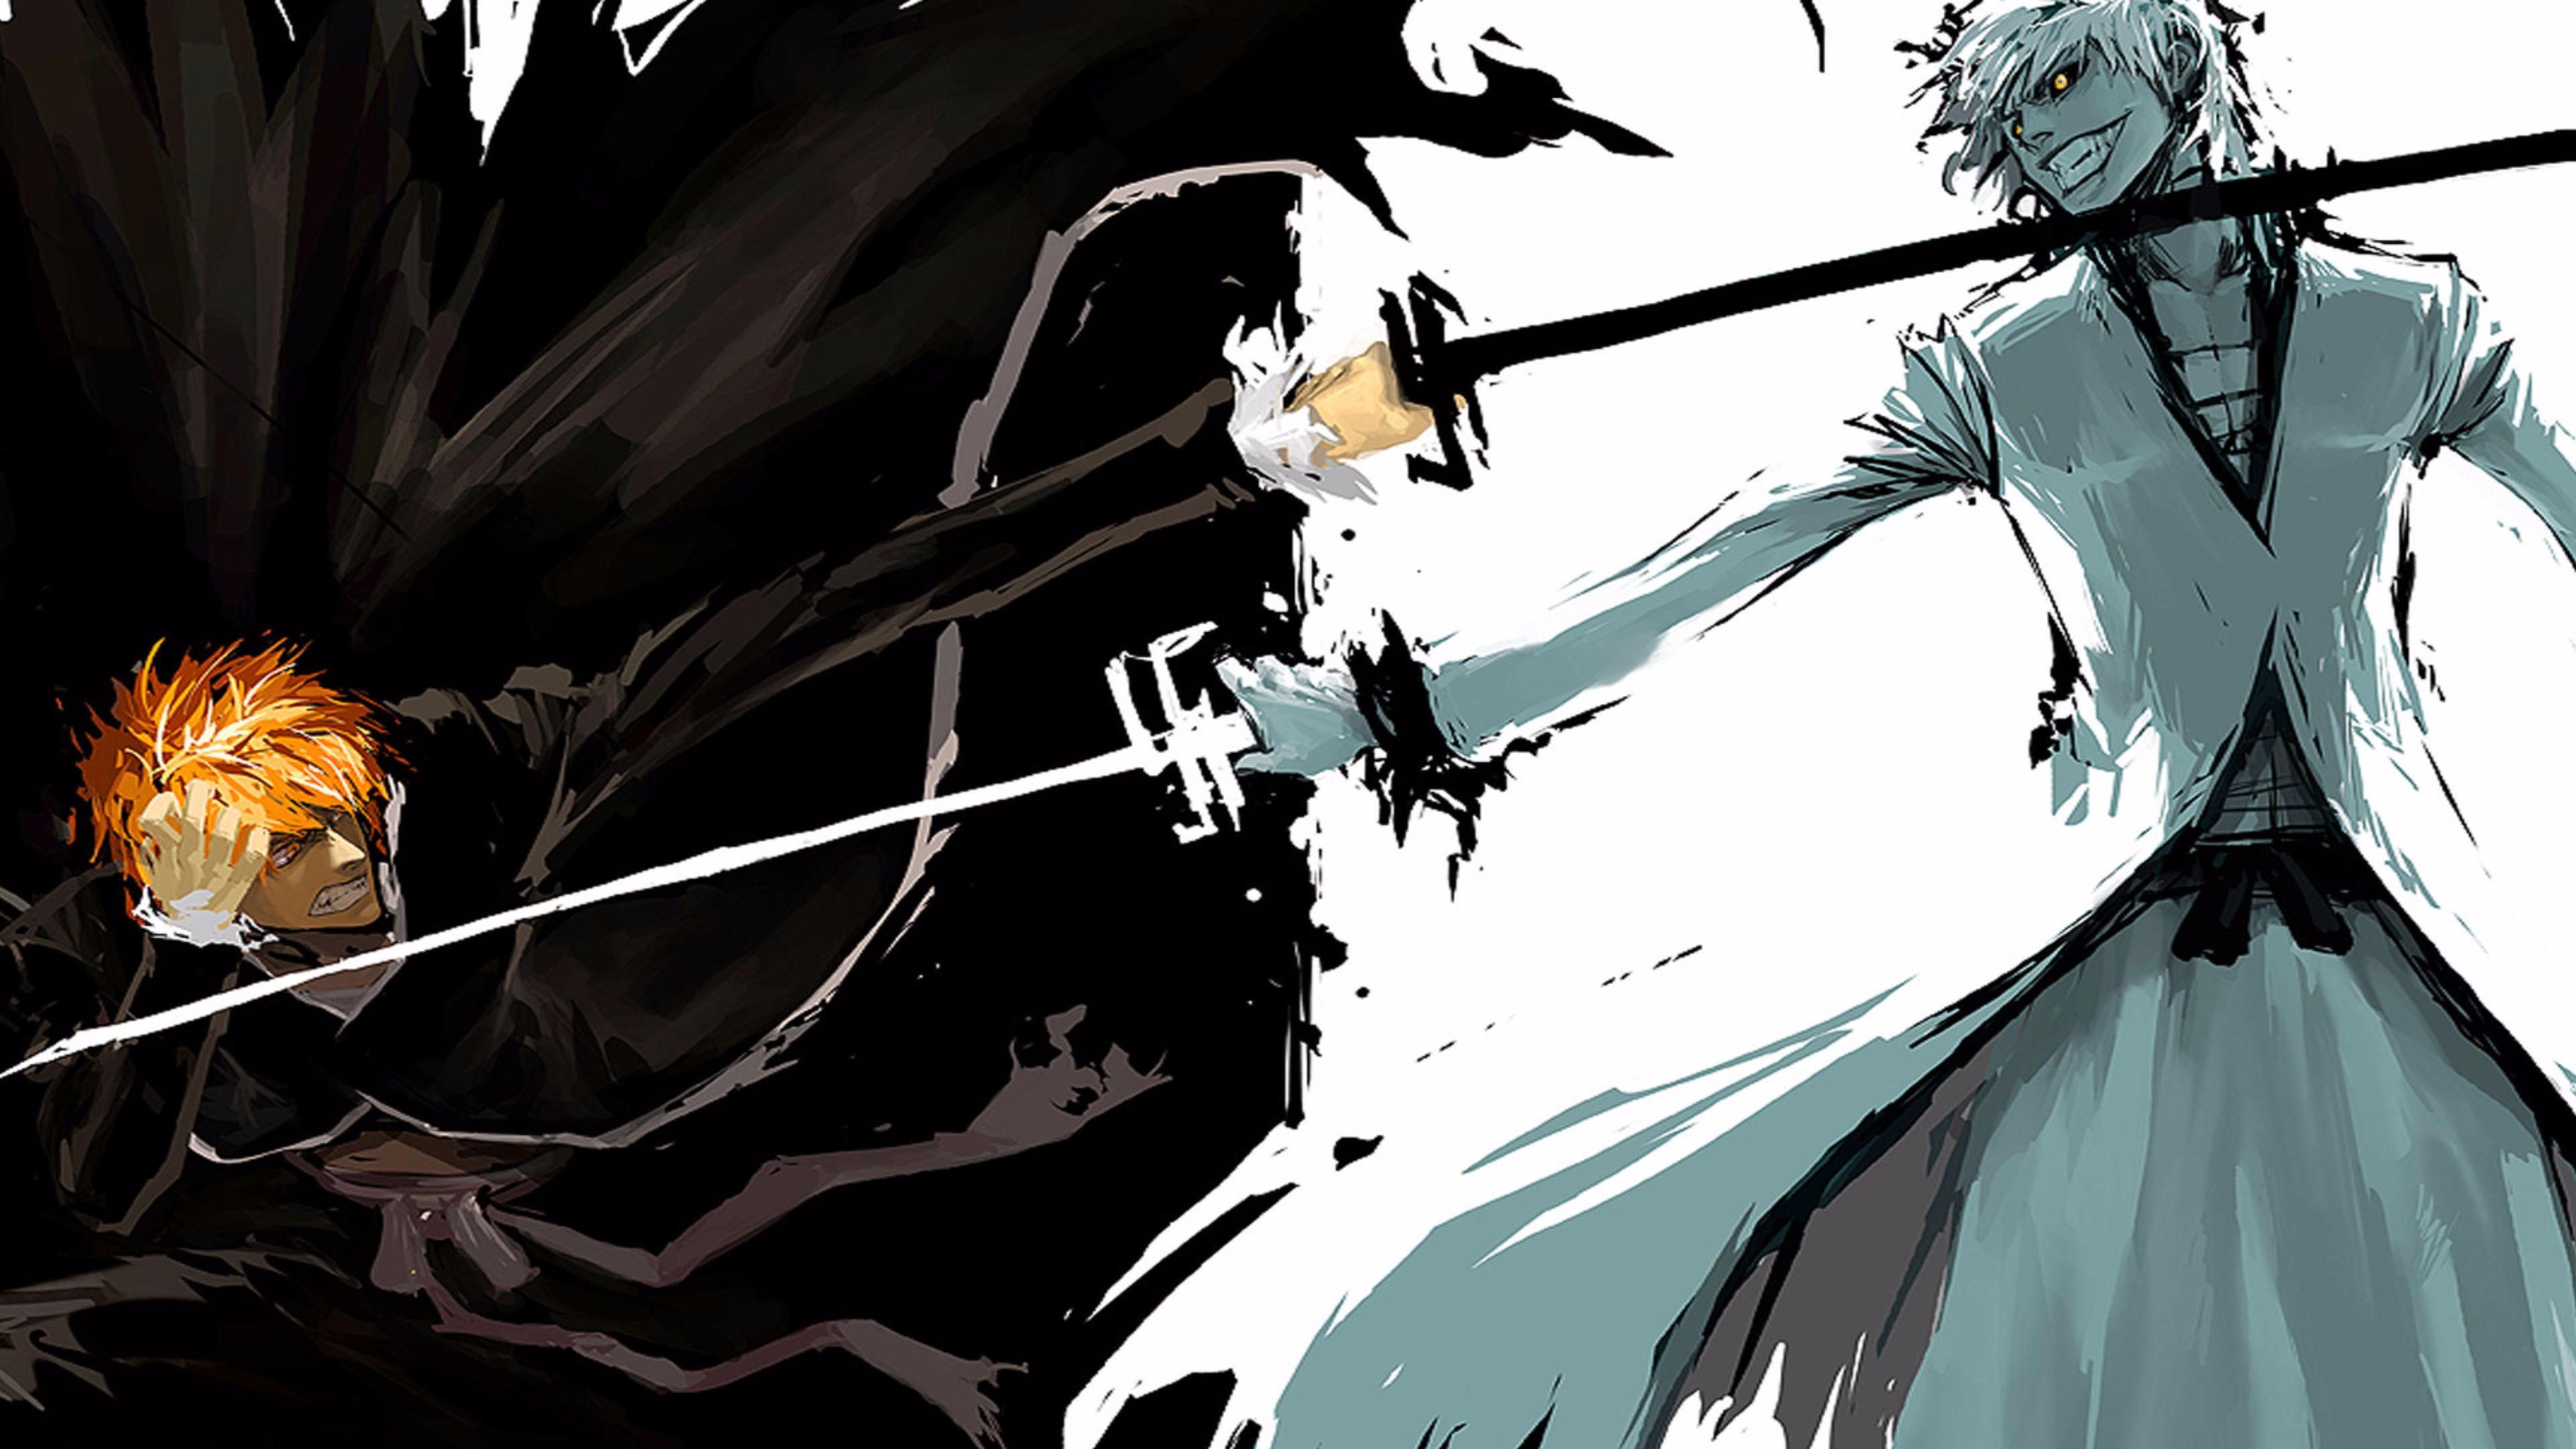 Anime wallpaper 2018 76 pictures - Anime phone wallpaper 4k ...